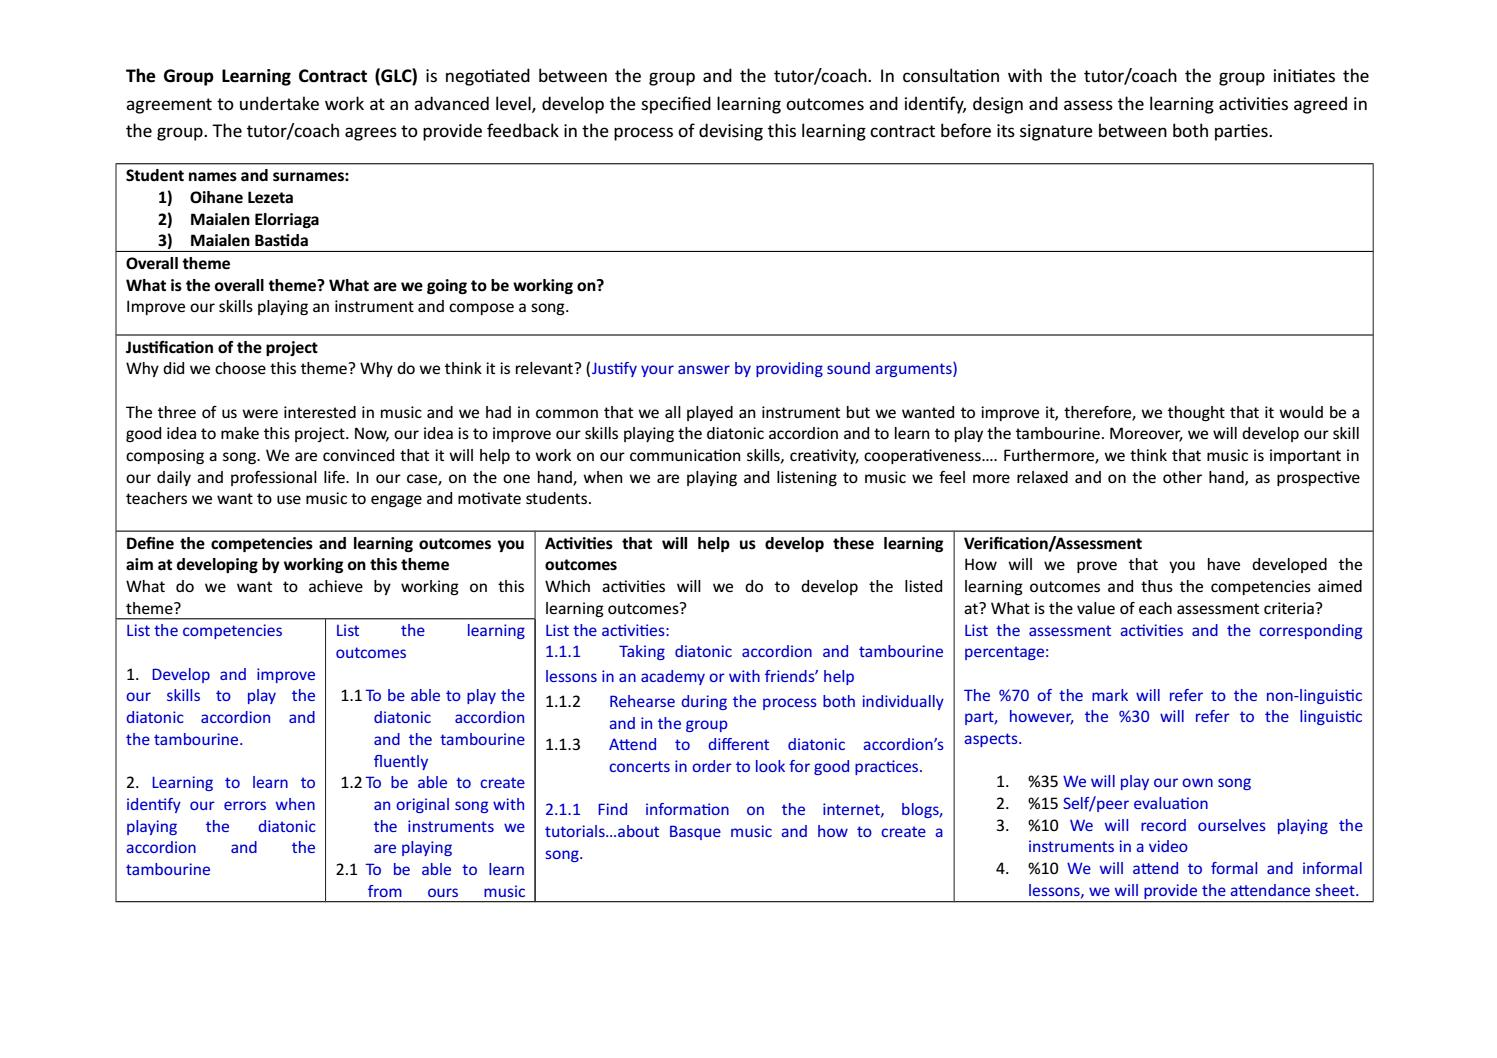 Group learning contract template maialen, oihane, maialen b